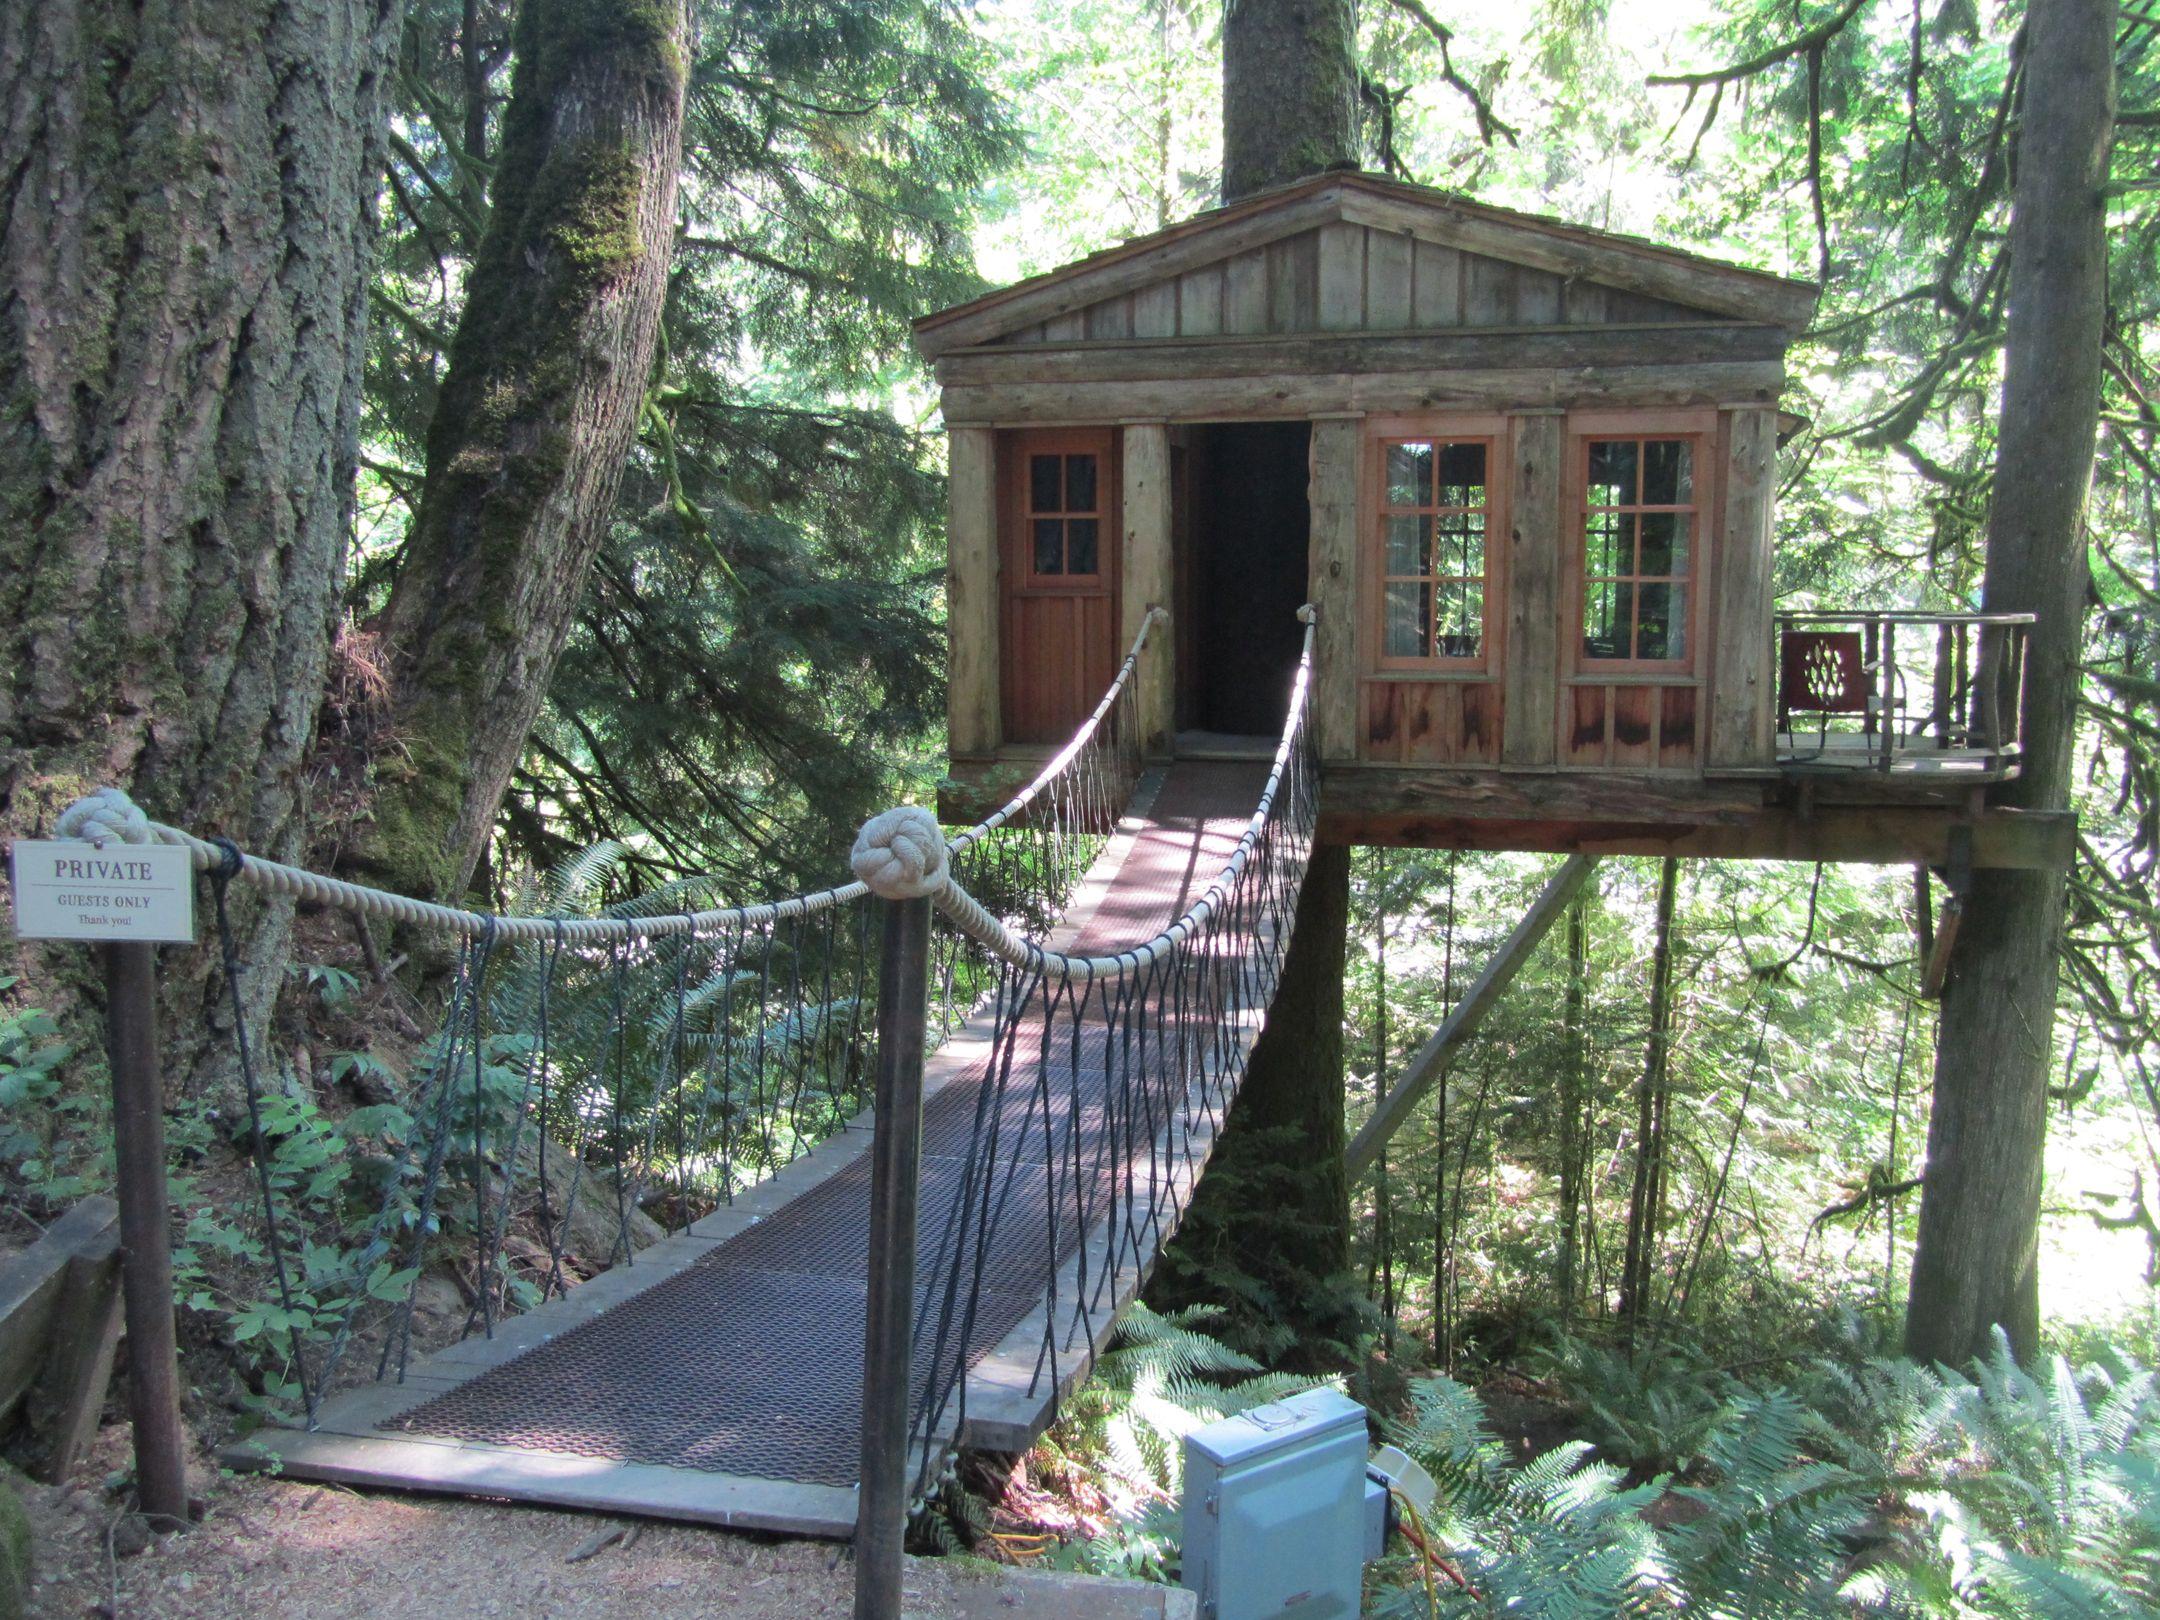 Treehouse Fall City Wa Part - 48: U201cTemple Of The Blue Moonu201d, Treehouse Point, Falls City, WA /